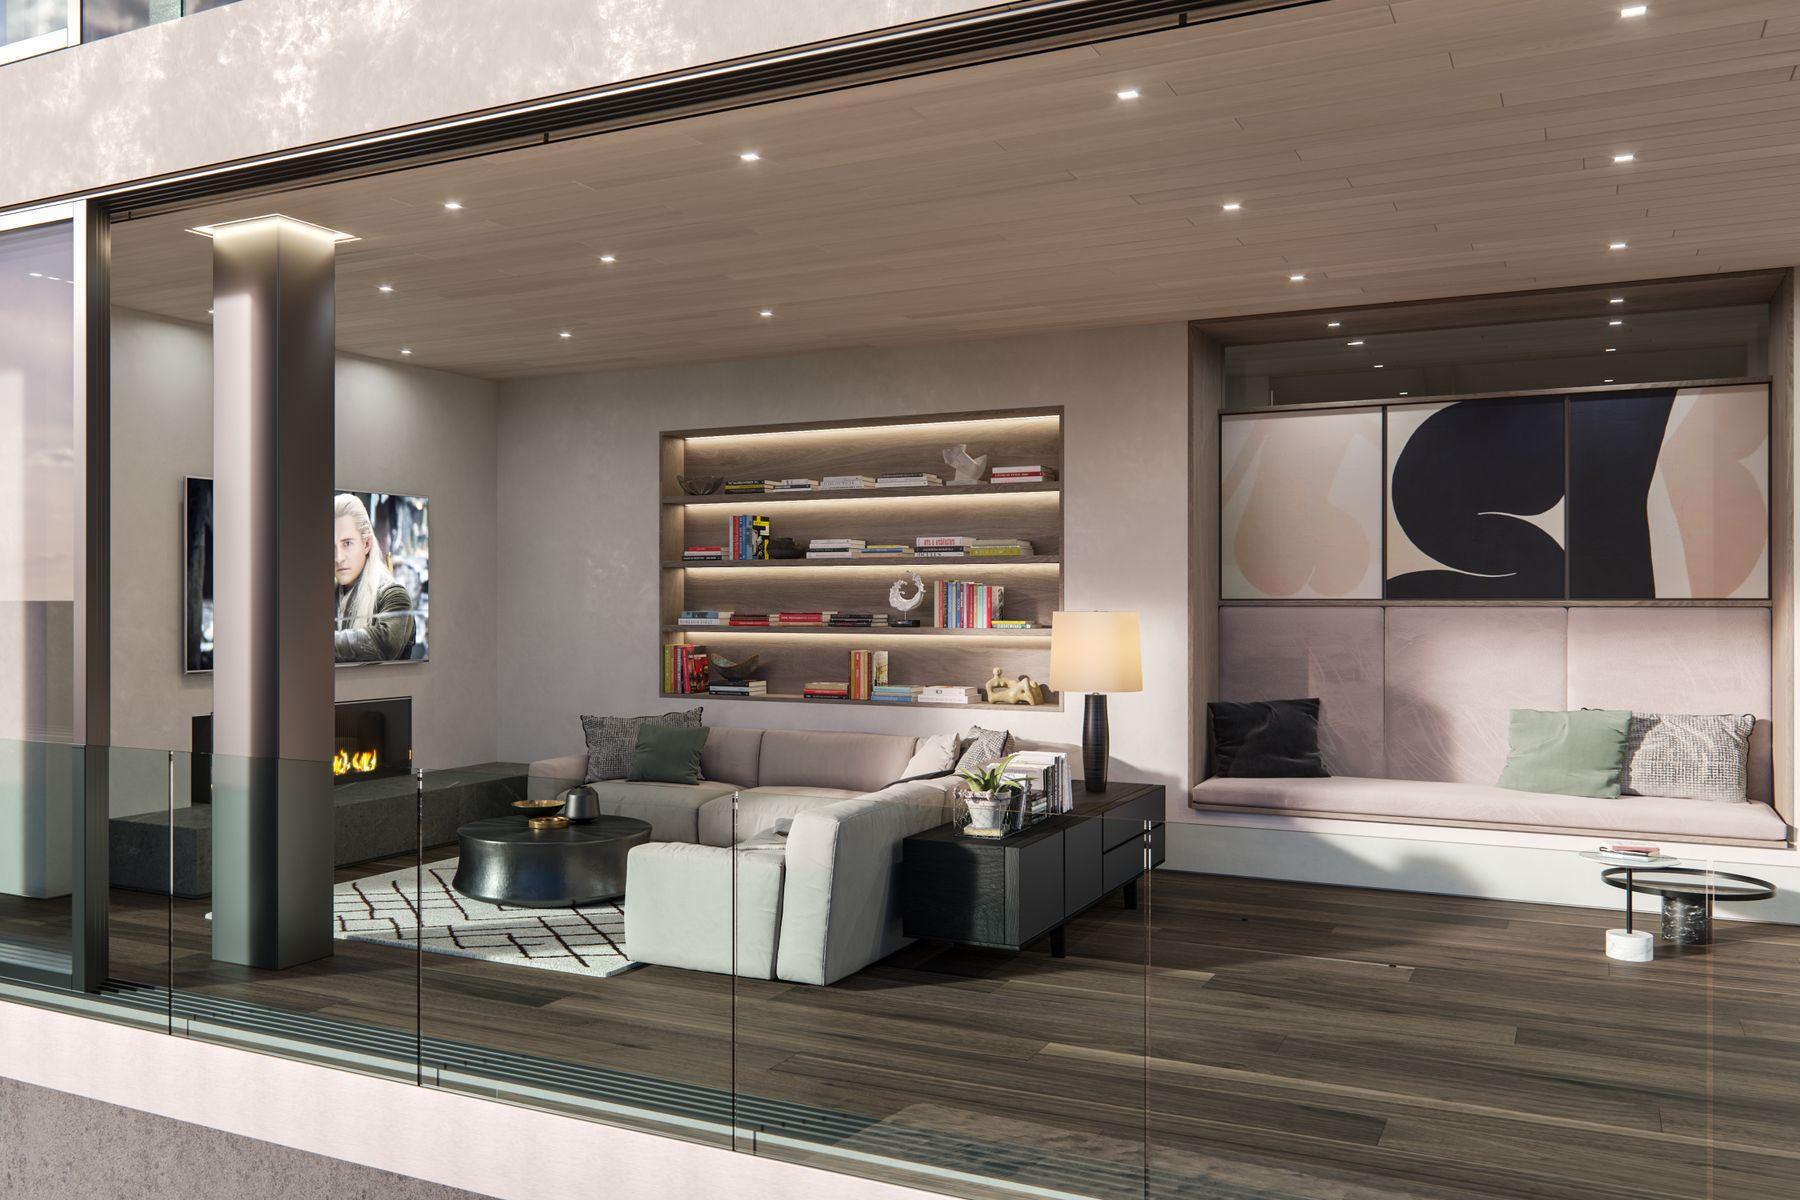 Additional photo for property listing at Brand New Malibu Oceanfront 24300 Malibu Road Malibu, California 90265 Estados Unidos